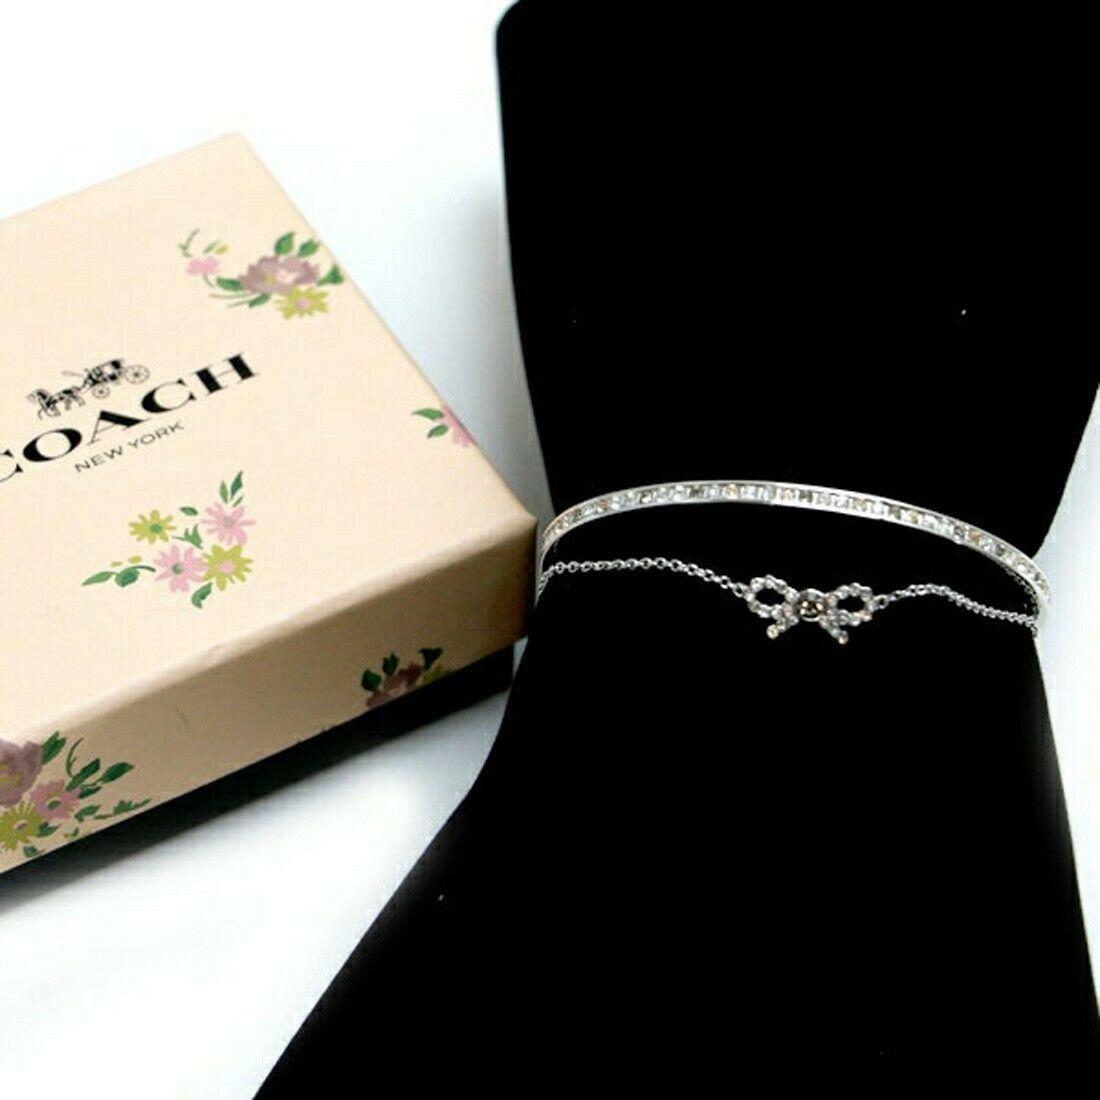 NWT COACH Bow Chain Cuff Stone Embellishment Bangle Cute Bracelet Silver F28866